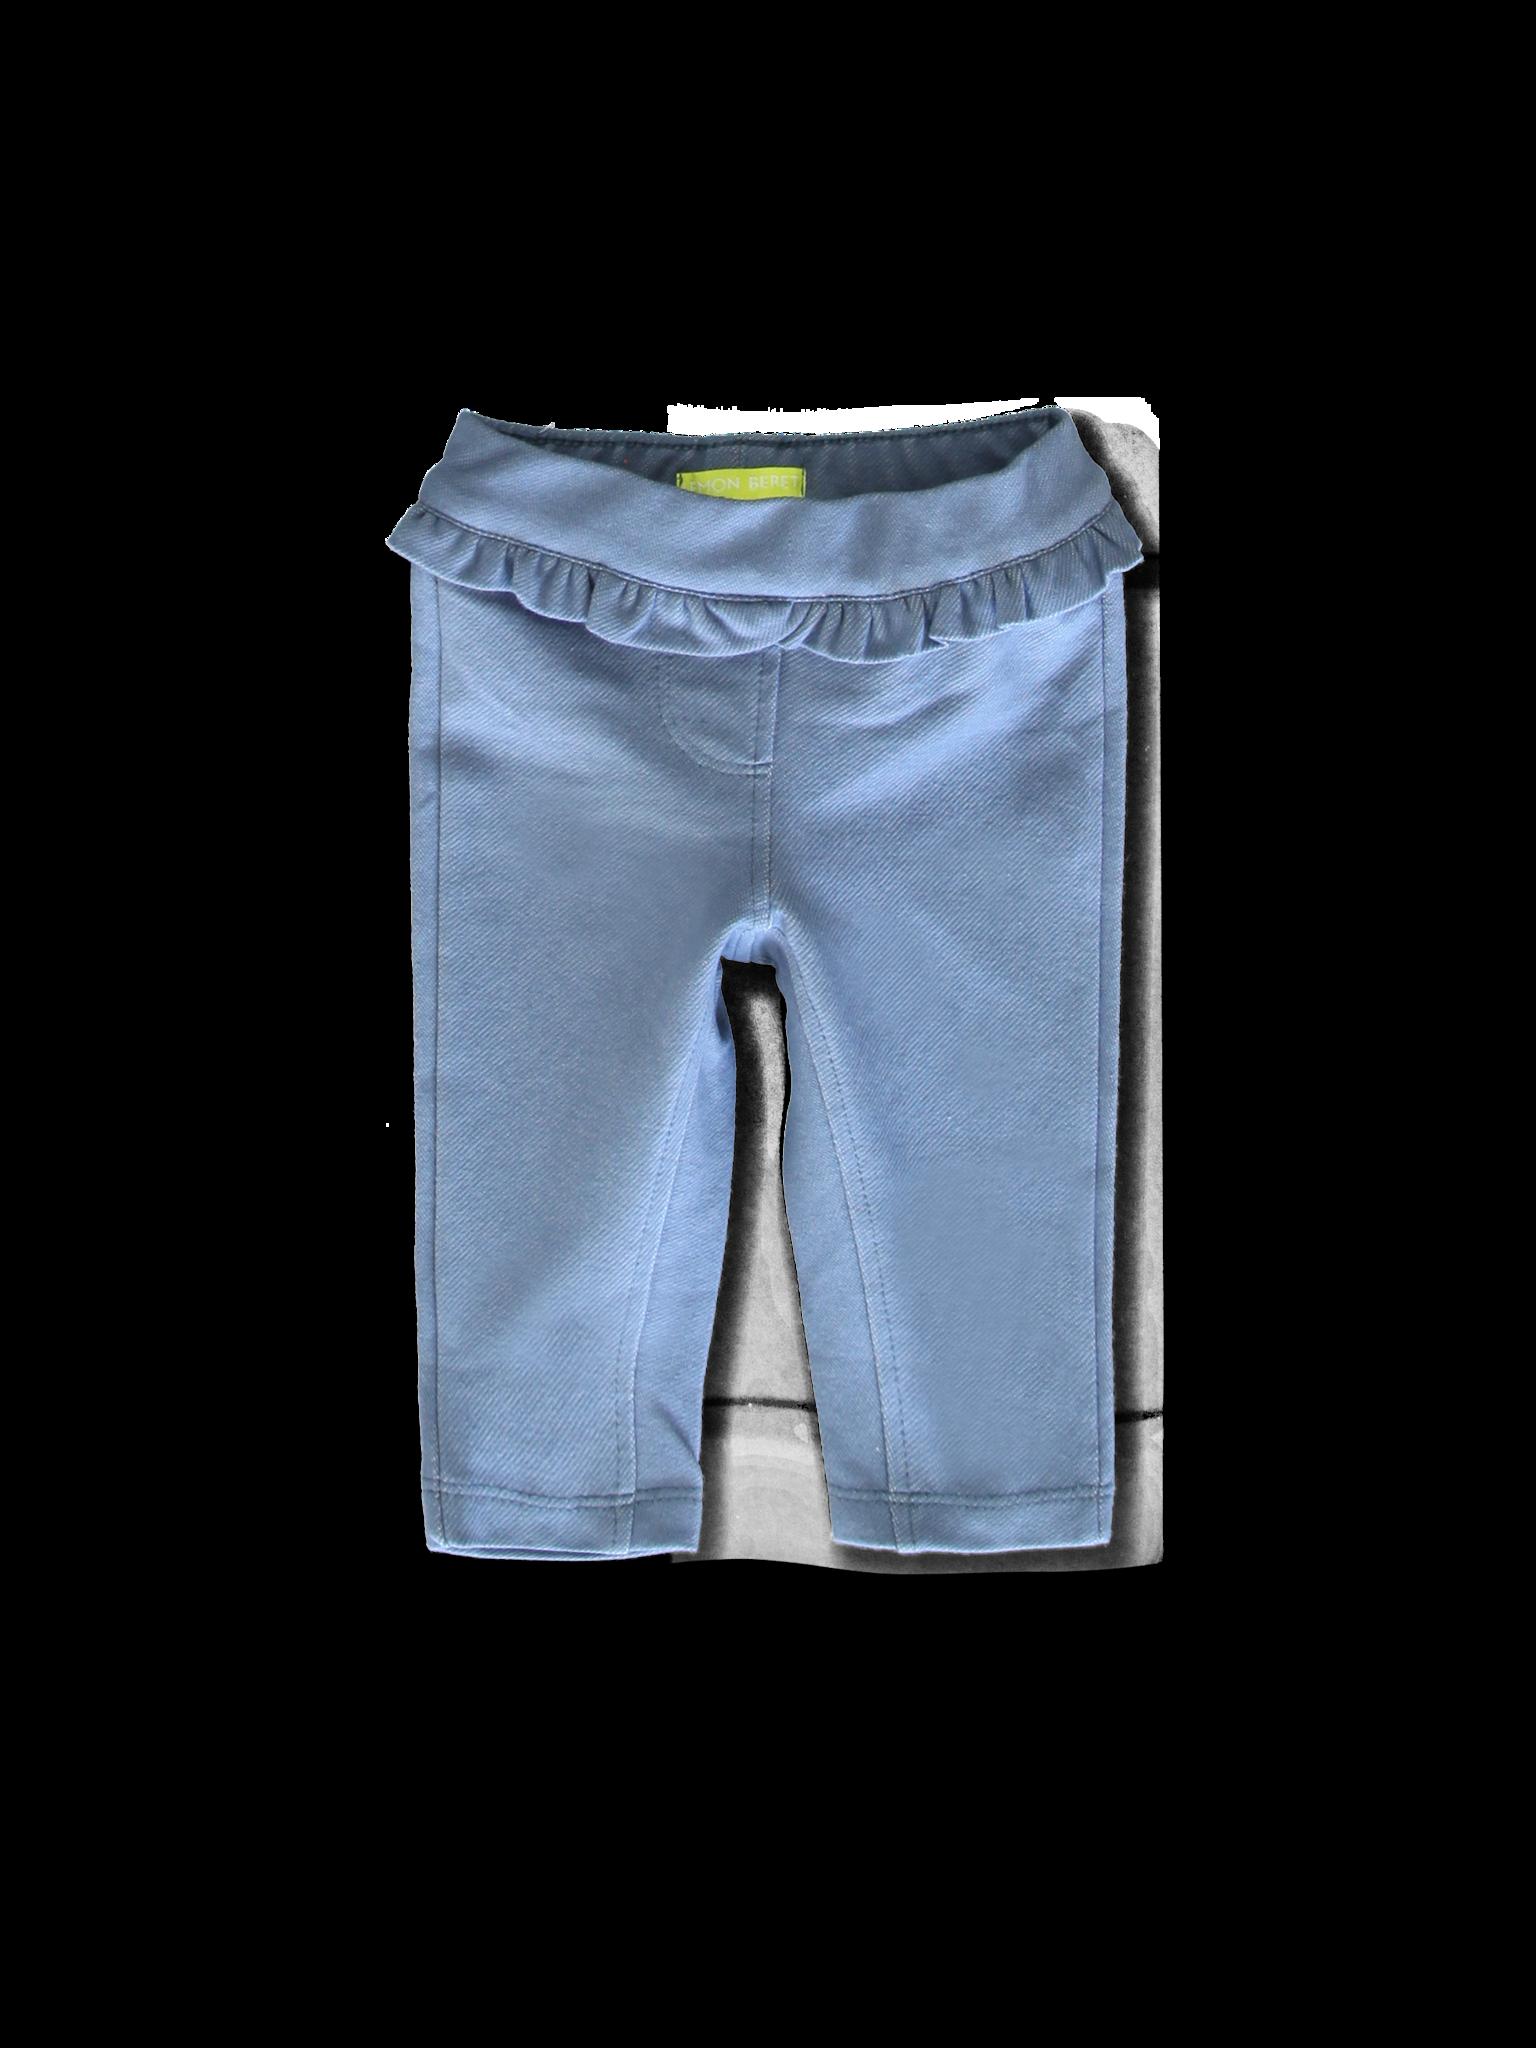 All Brands | Summerproducts Baby | Legging | 8 pcs/box